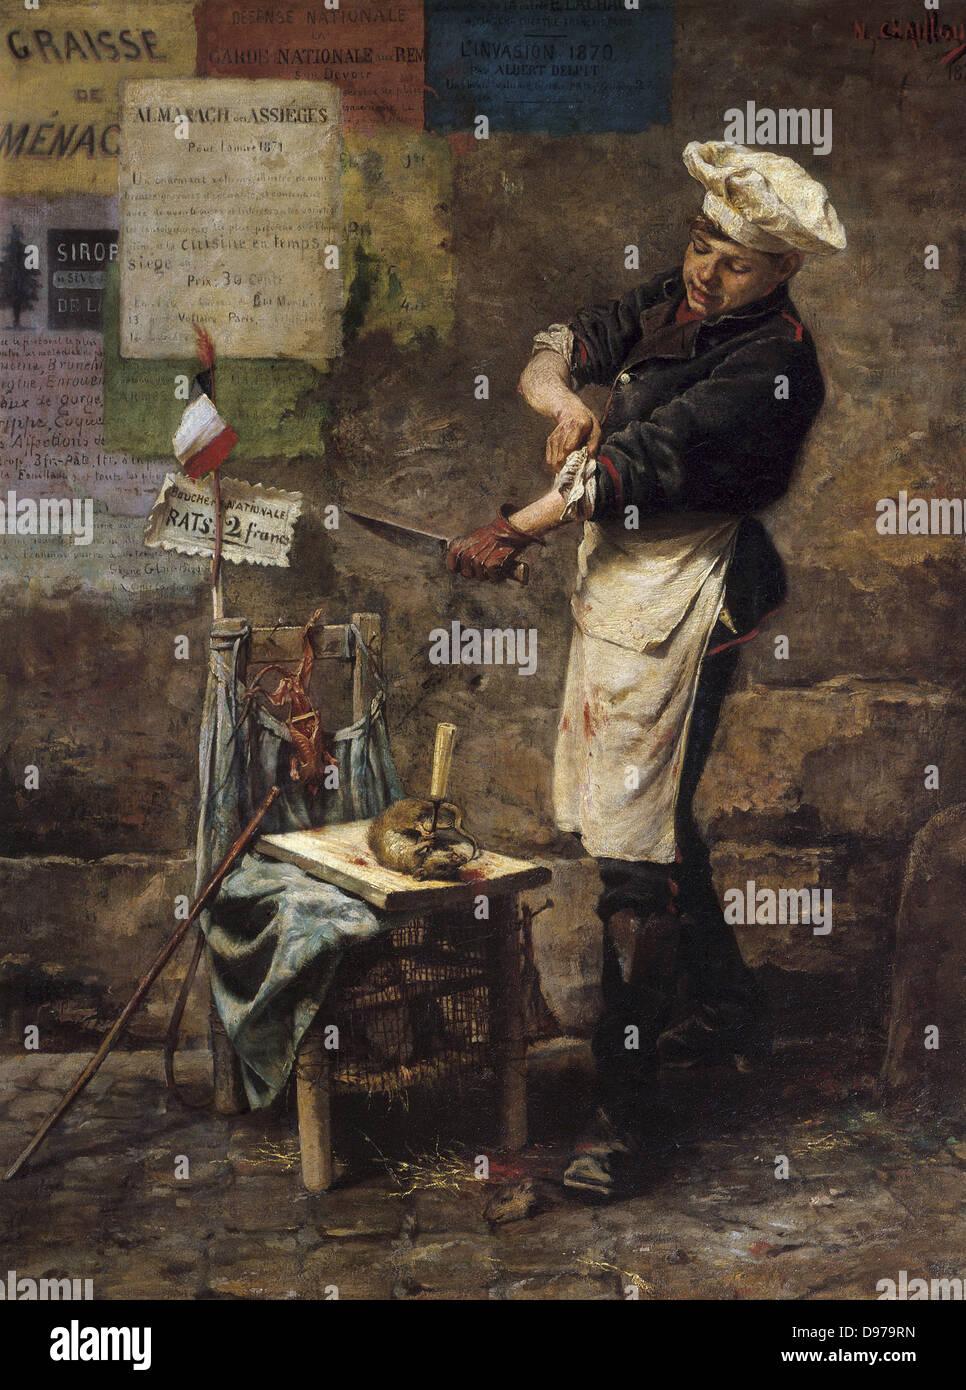 Narcisse Chaillou The Rat vendor during the Siege of Paris in 1870 1870 Carnavalet Museum - Paris - Stock Image